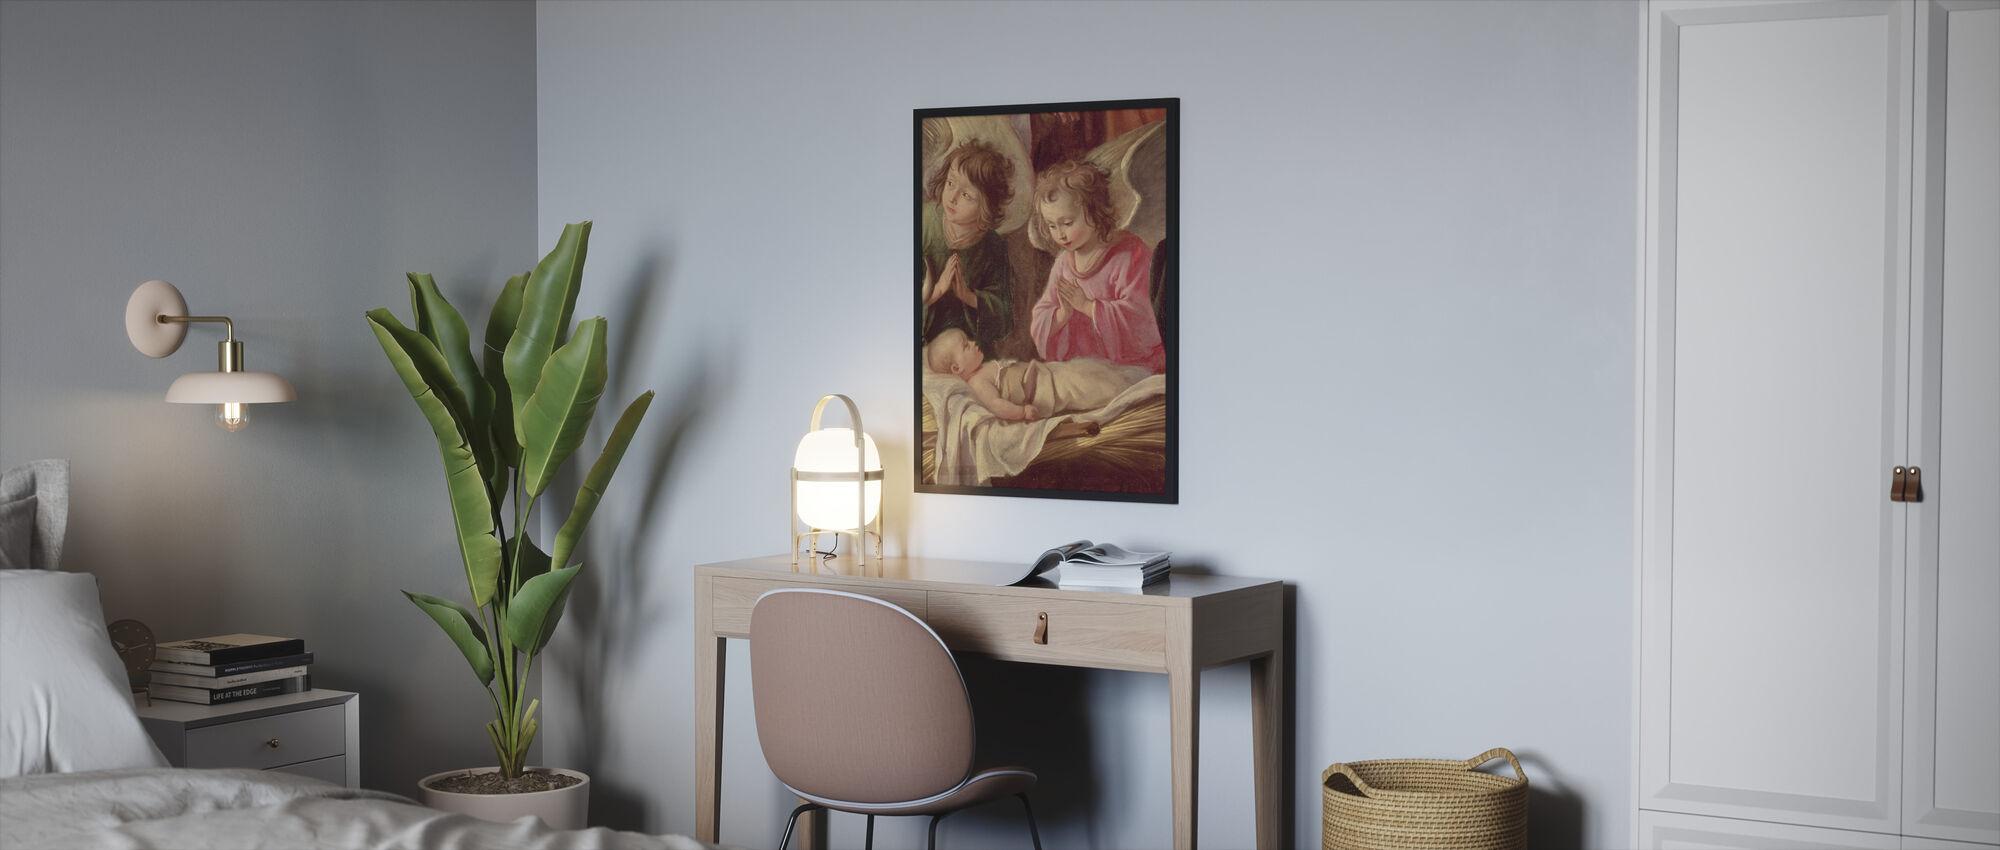 Adoration of the Shepherds - Antoine Le Nain - Framed print - Bedroom